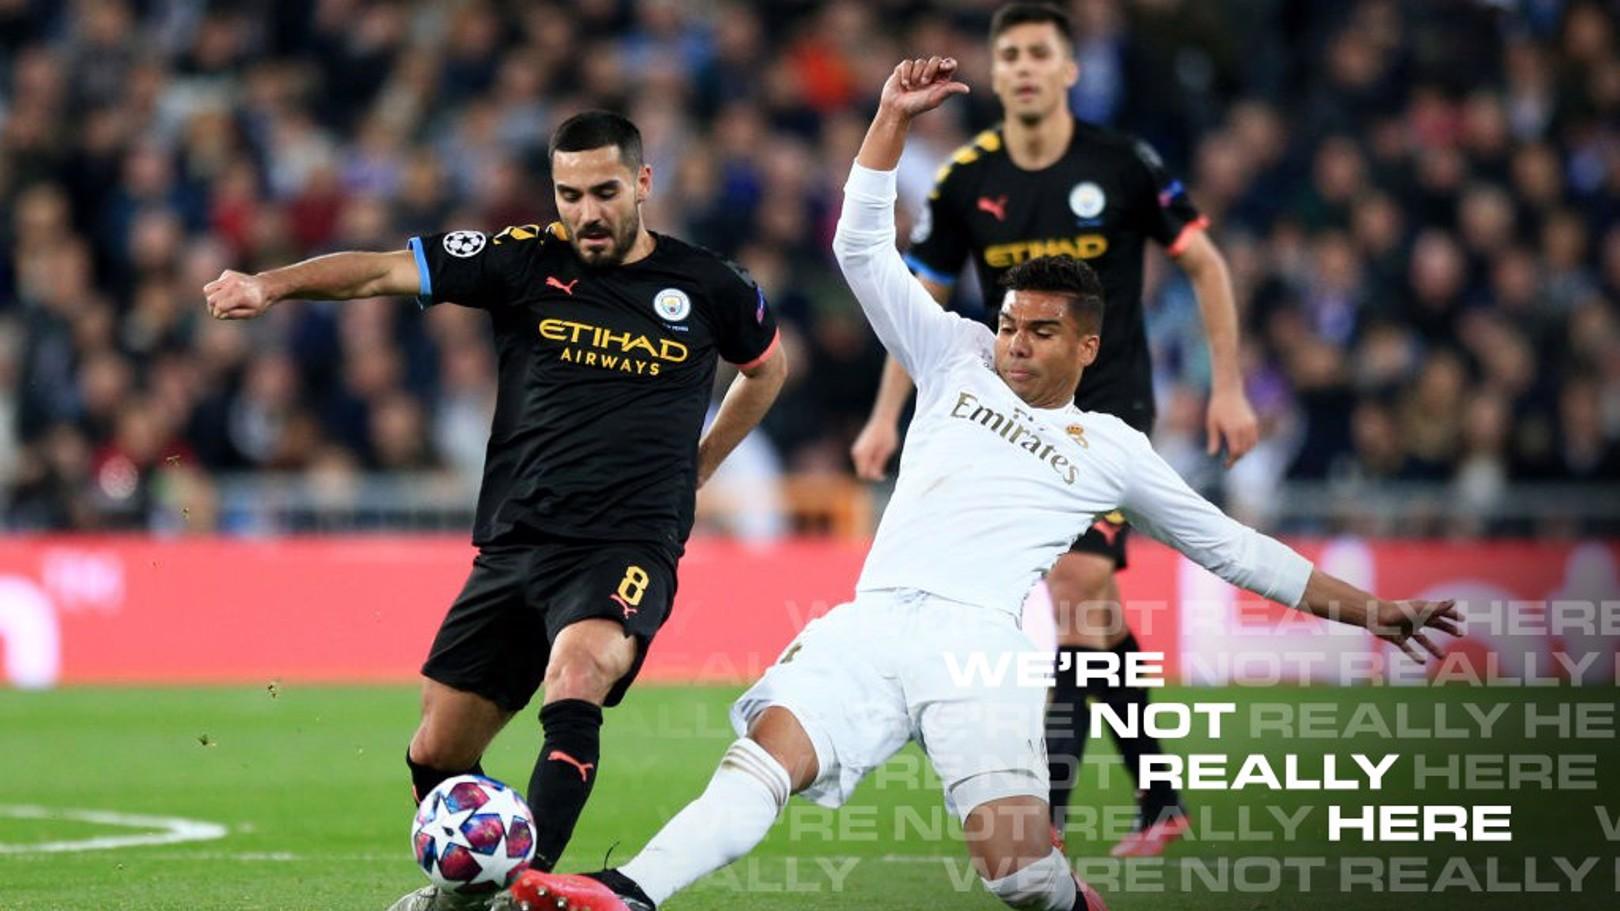 Txiki Begiristain: City not looking beyond Real Madrid